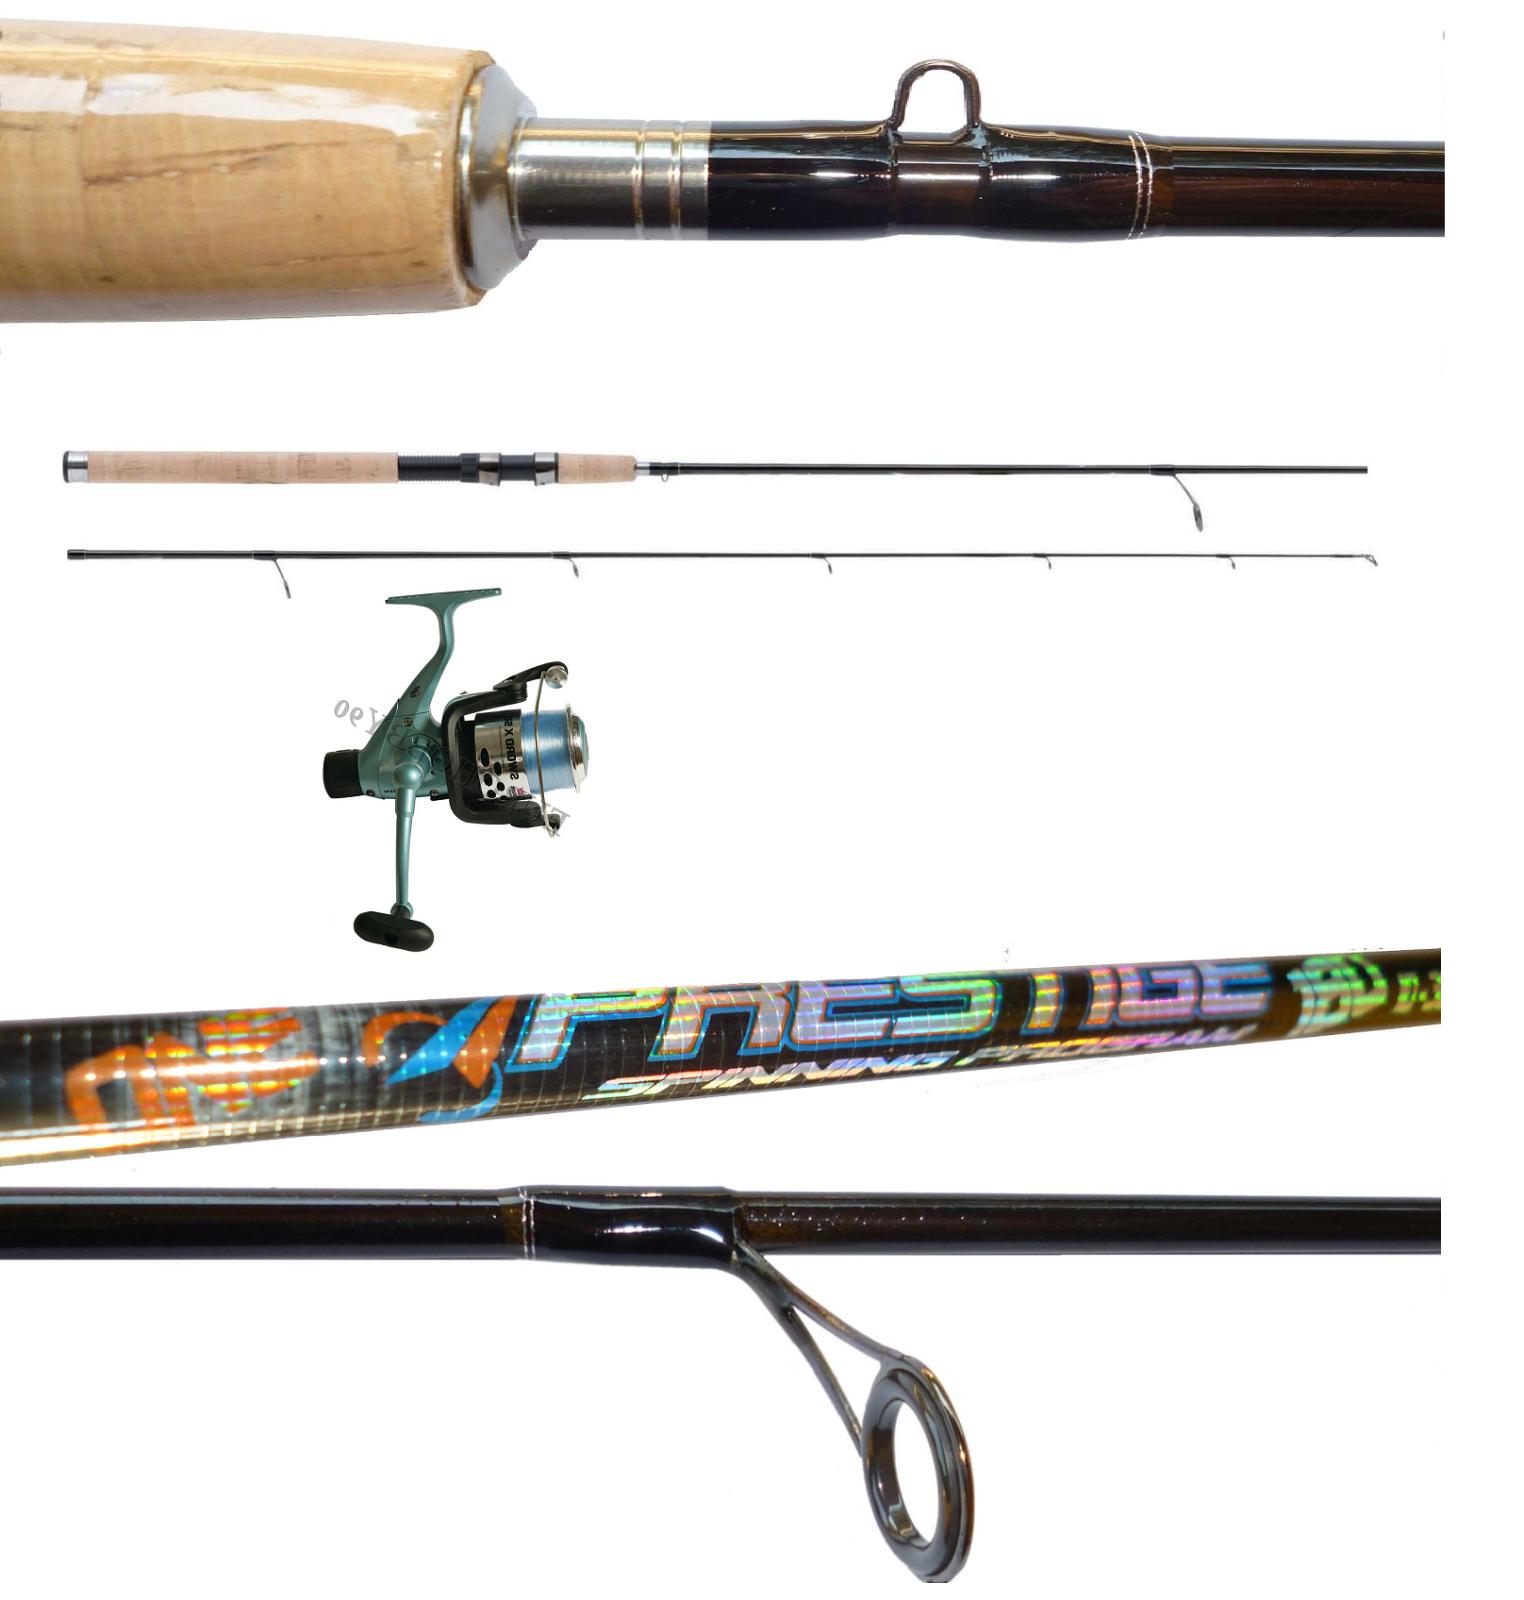 Kit spinning canna prestige 1.80m 1.80m 1.80m 10/30g + mulinello sword 2000 bass trota eu ed6d5e